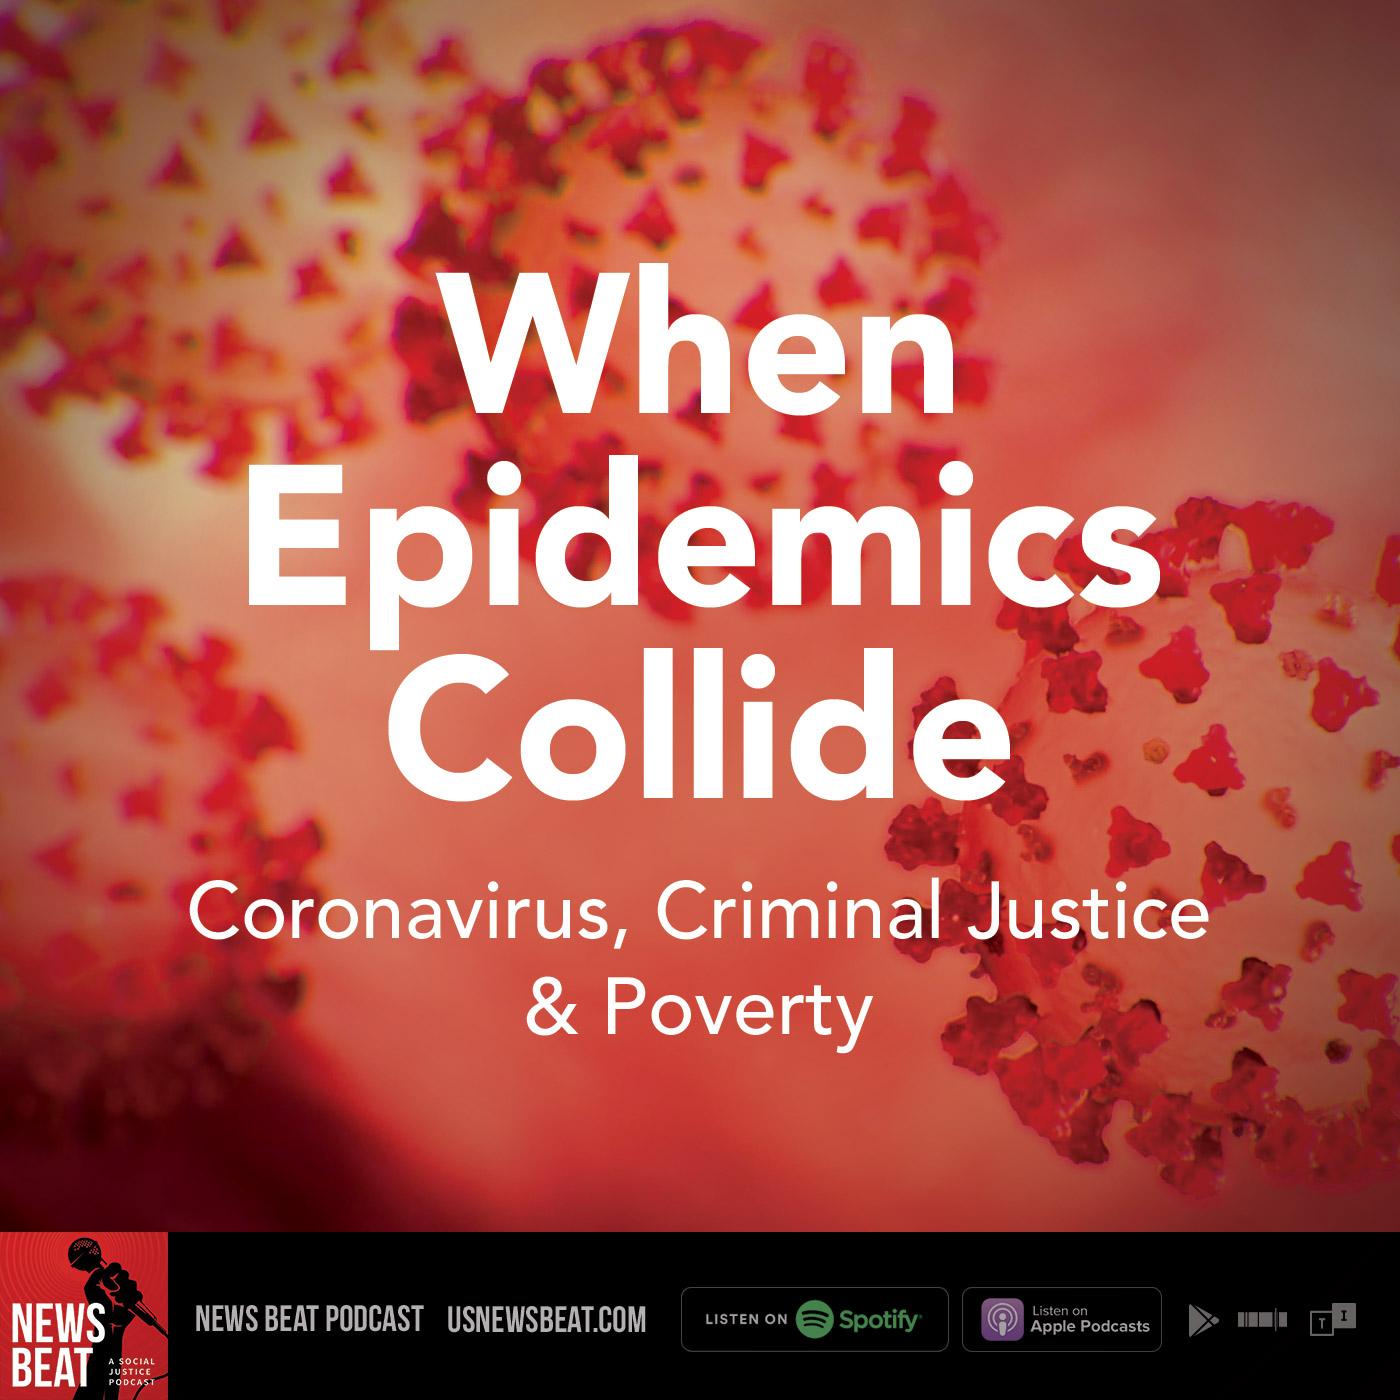 When Epidemics Collide